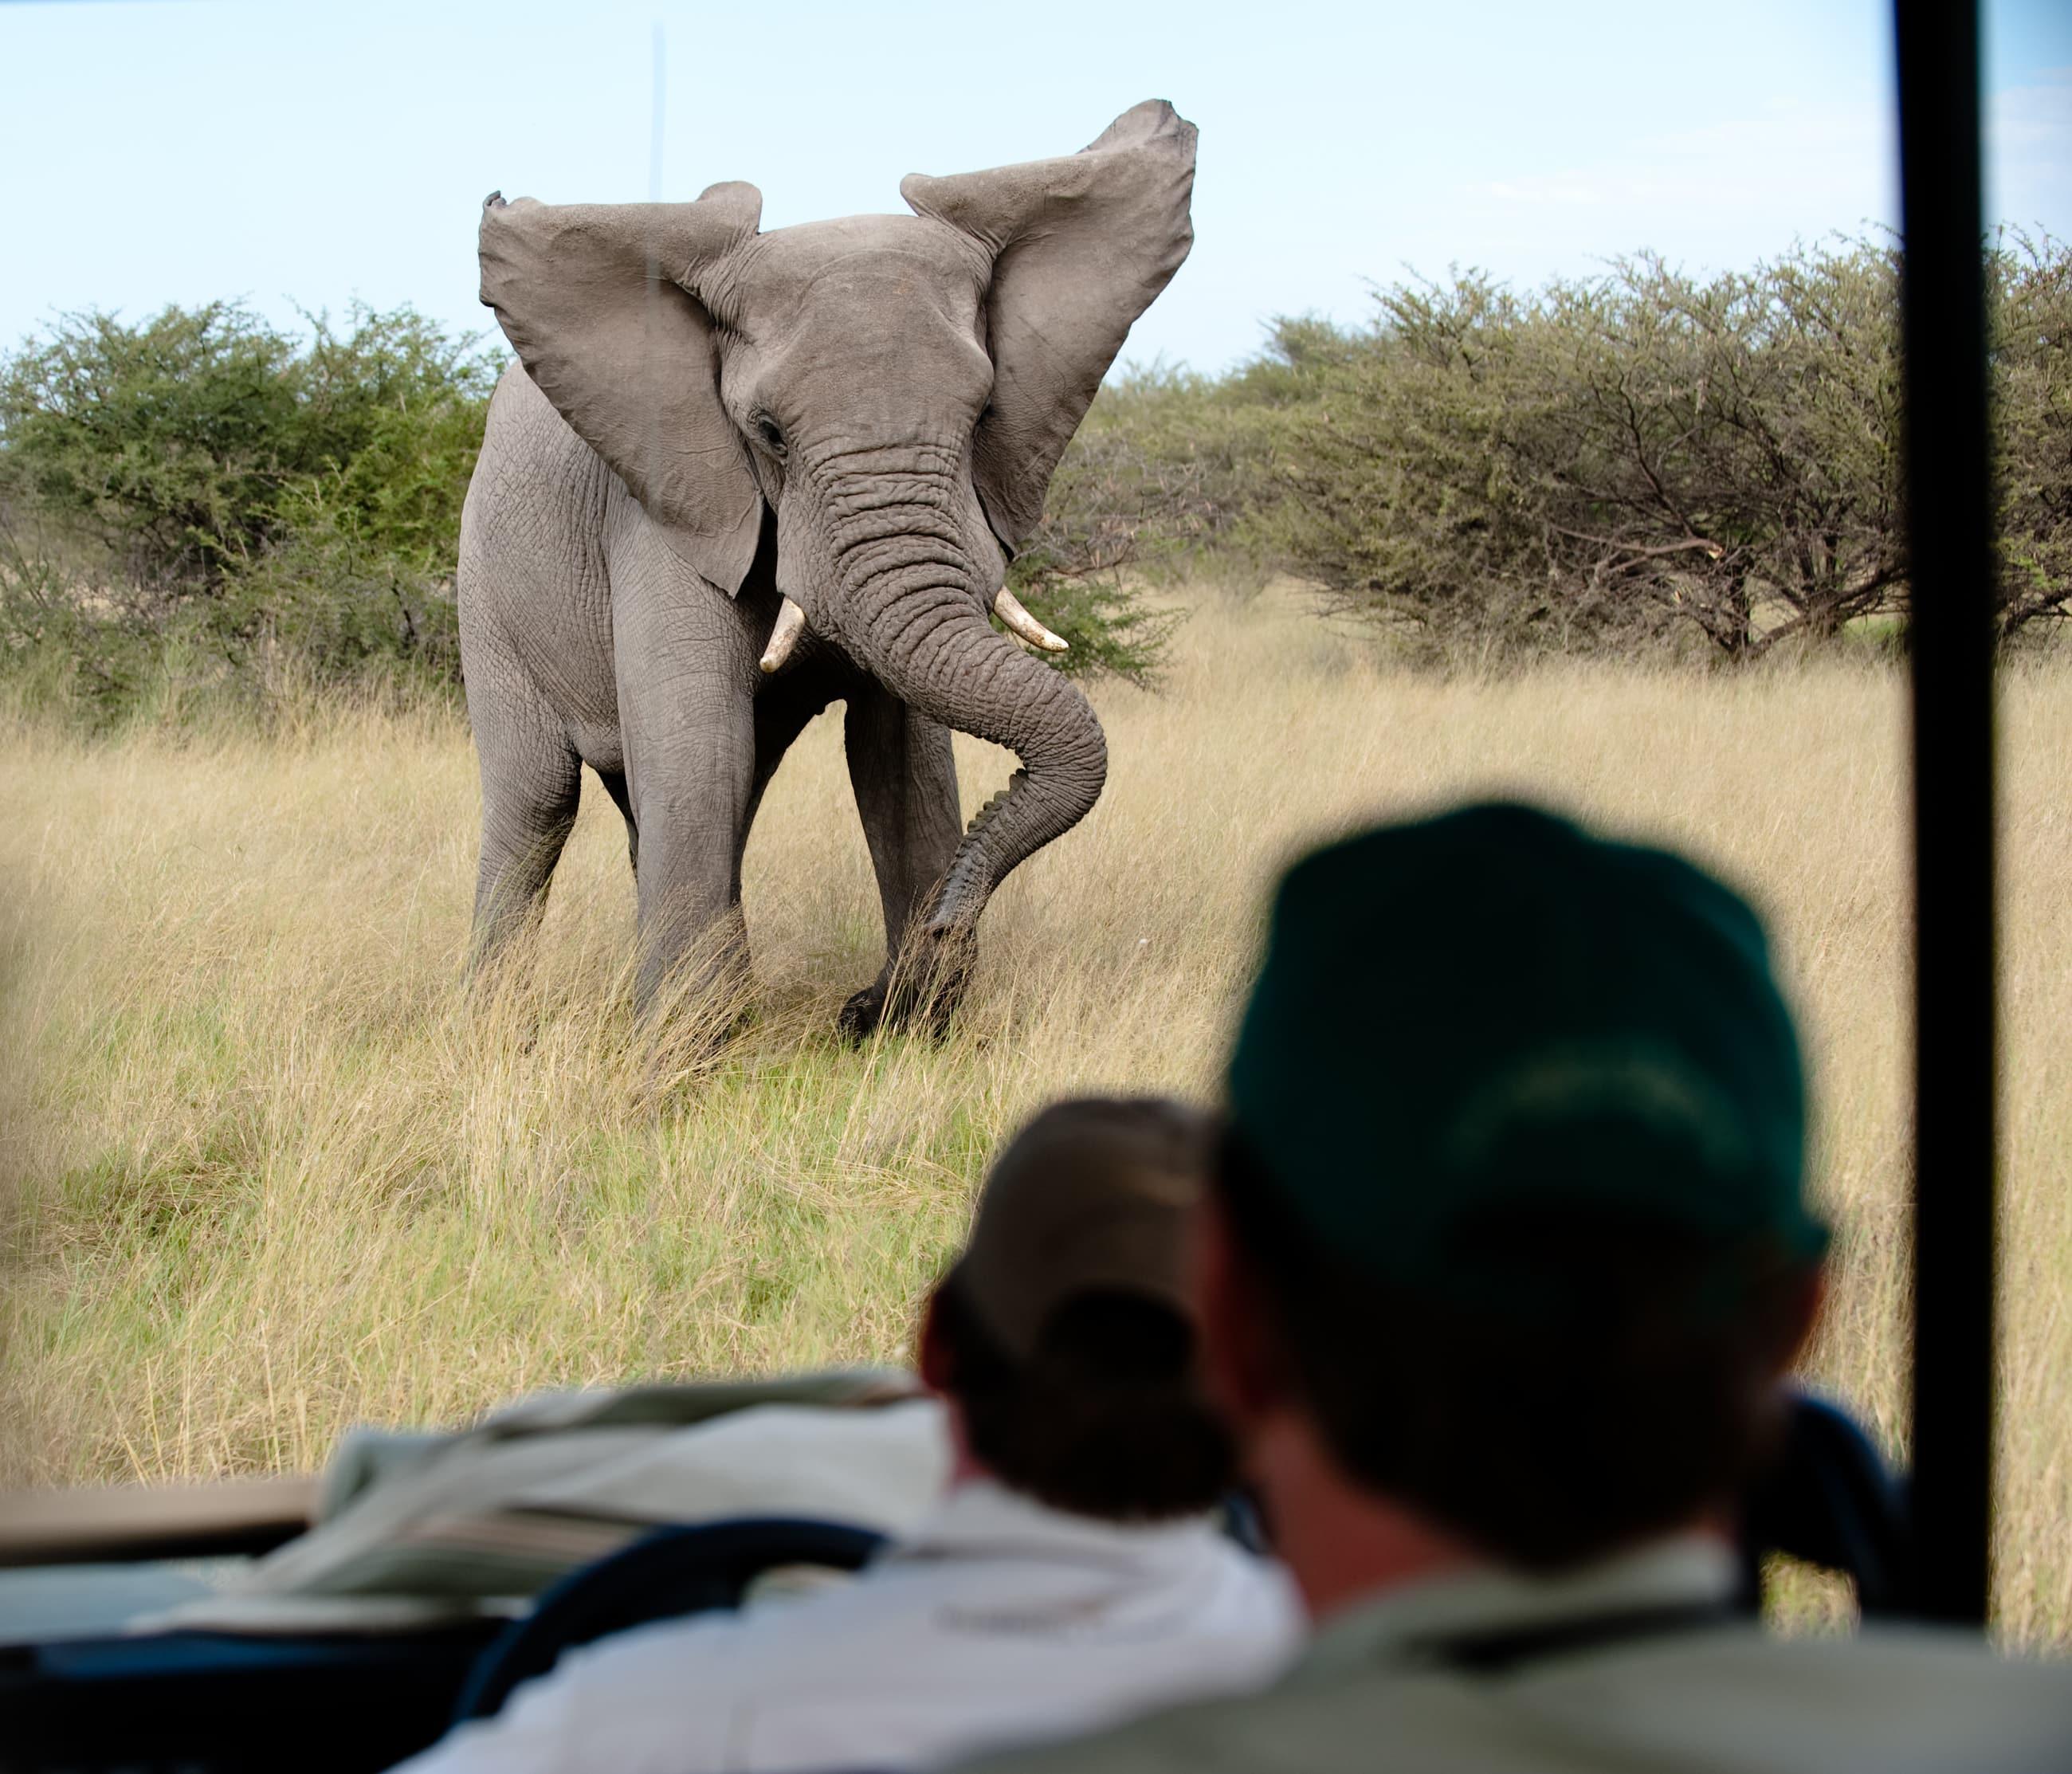 elephant tramples tourist image